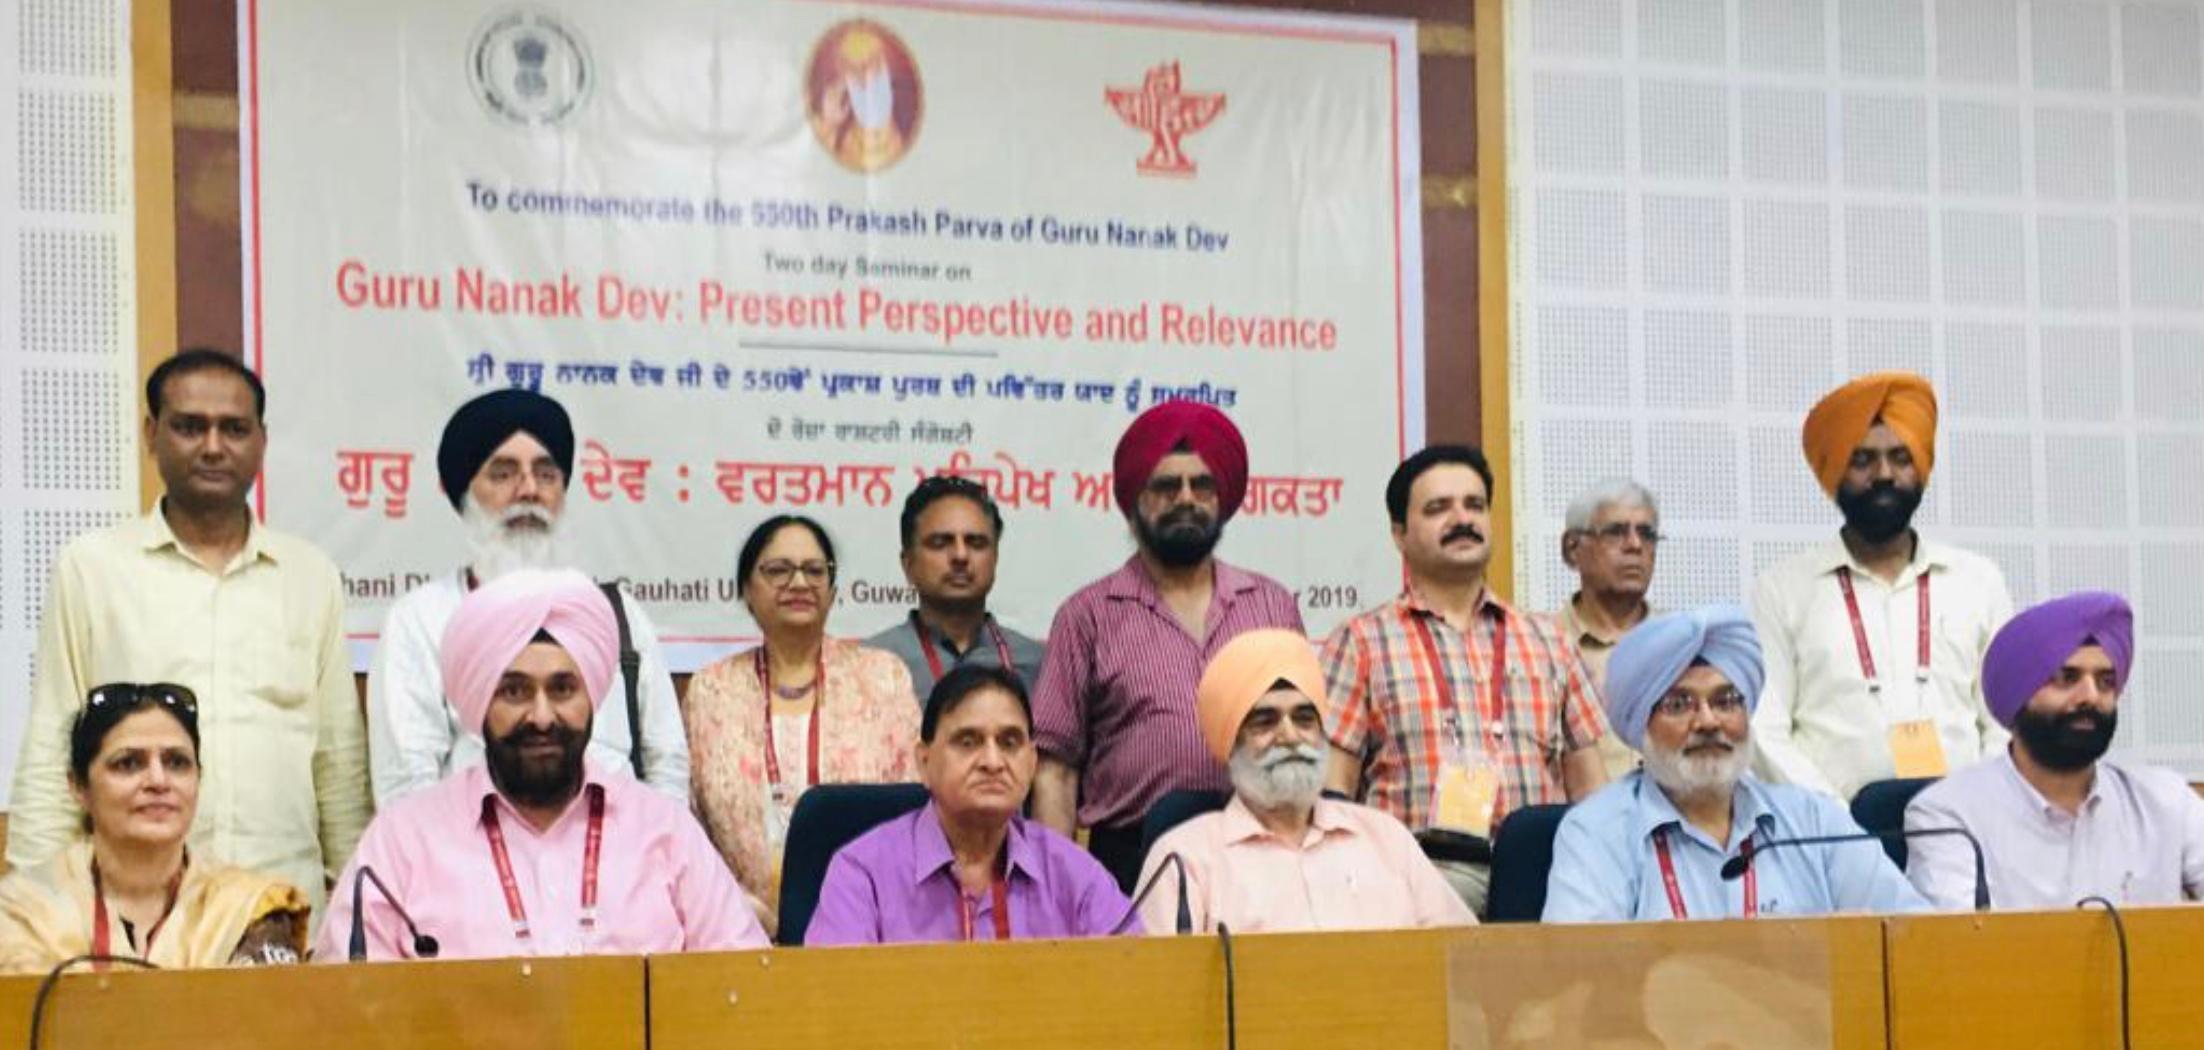 CONFERENCE BEING ORGANISED BY BHARATIYA SAHITYA AKADEMI NEW DELHI